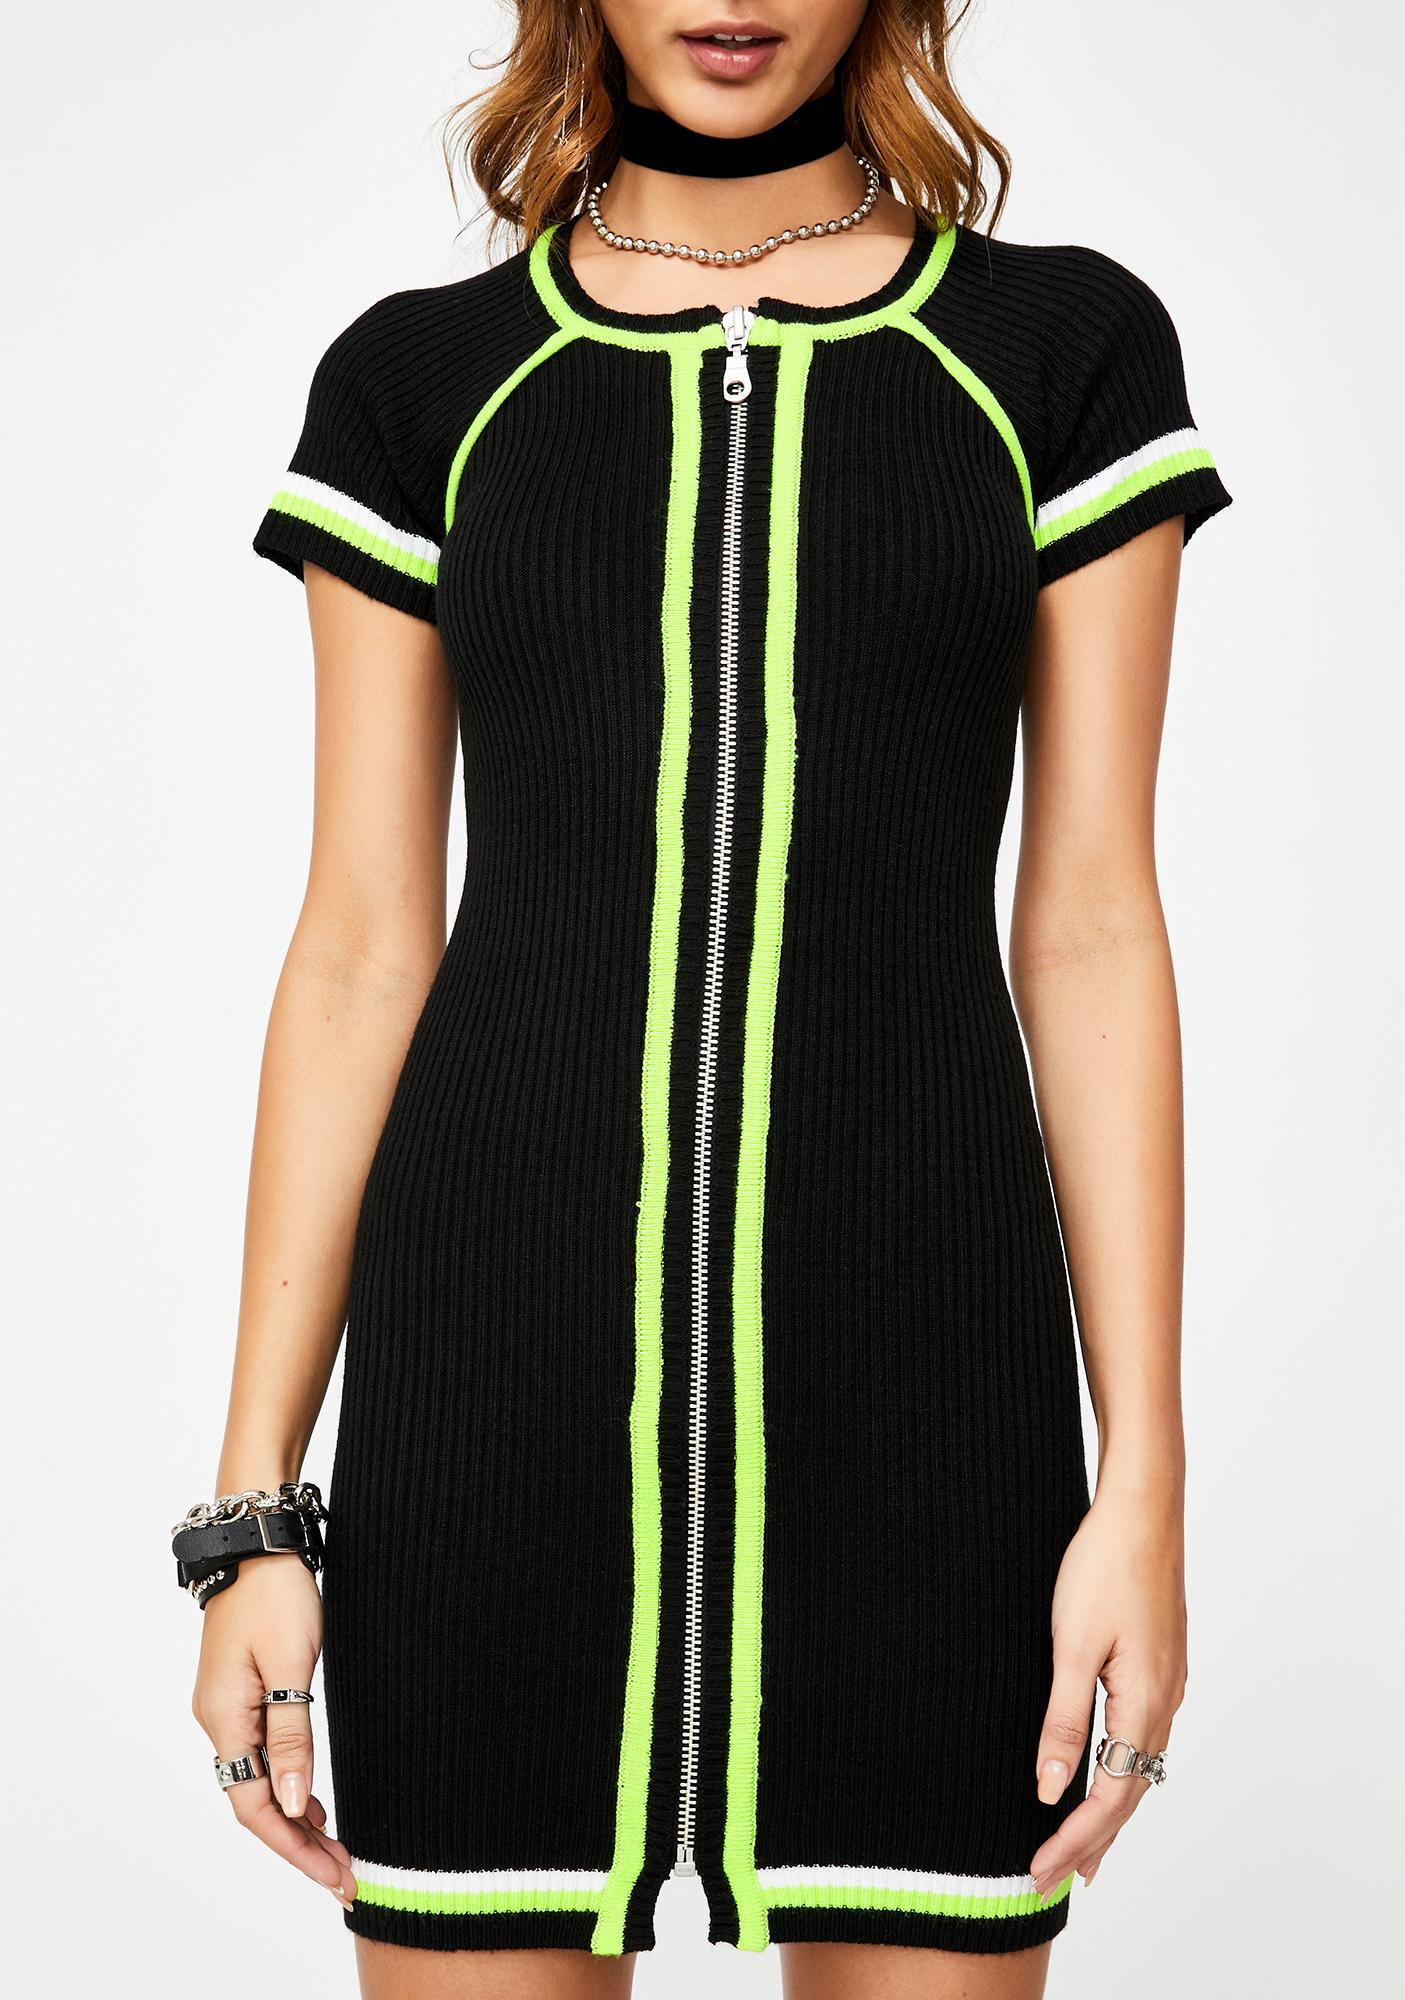 The Ragged Priest Element Knit Dress